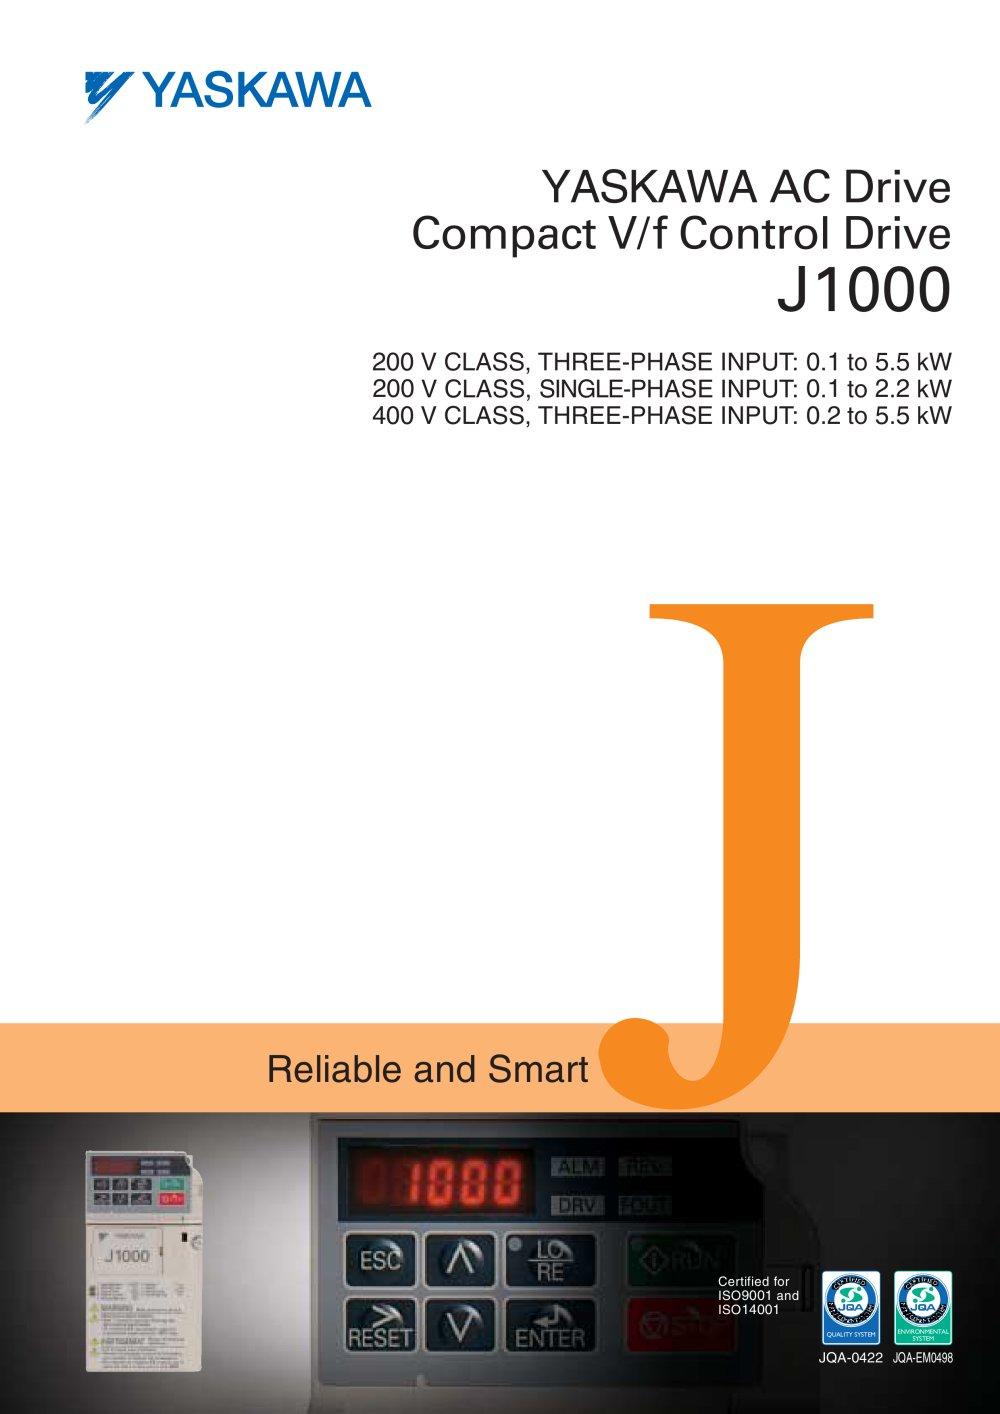 Yaskawa Ac Drive Compact V F Control J1000 Pdf A1000 Wiring Diagram 1 53 Pages